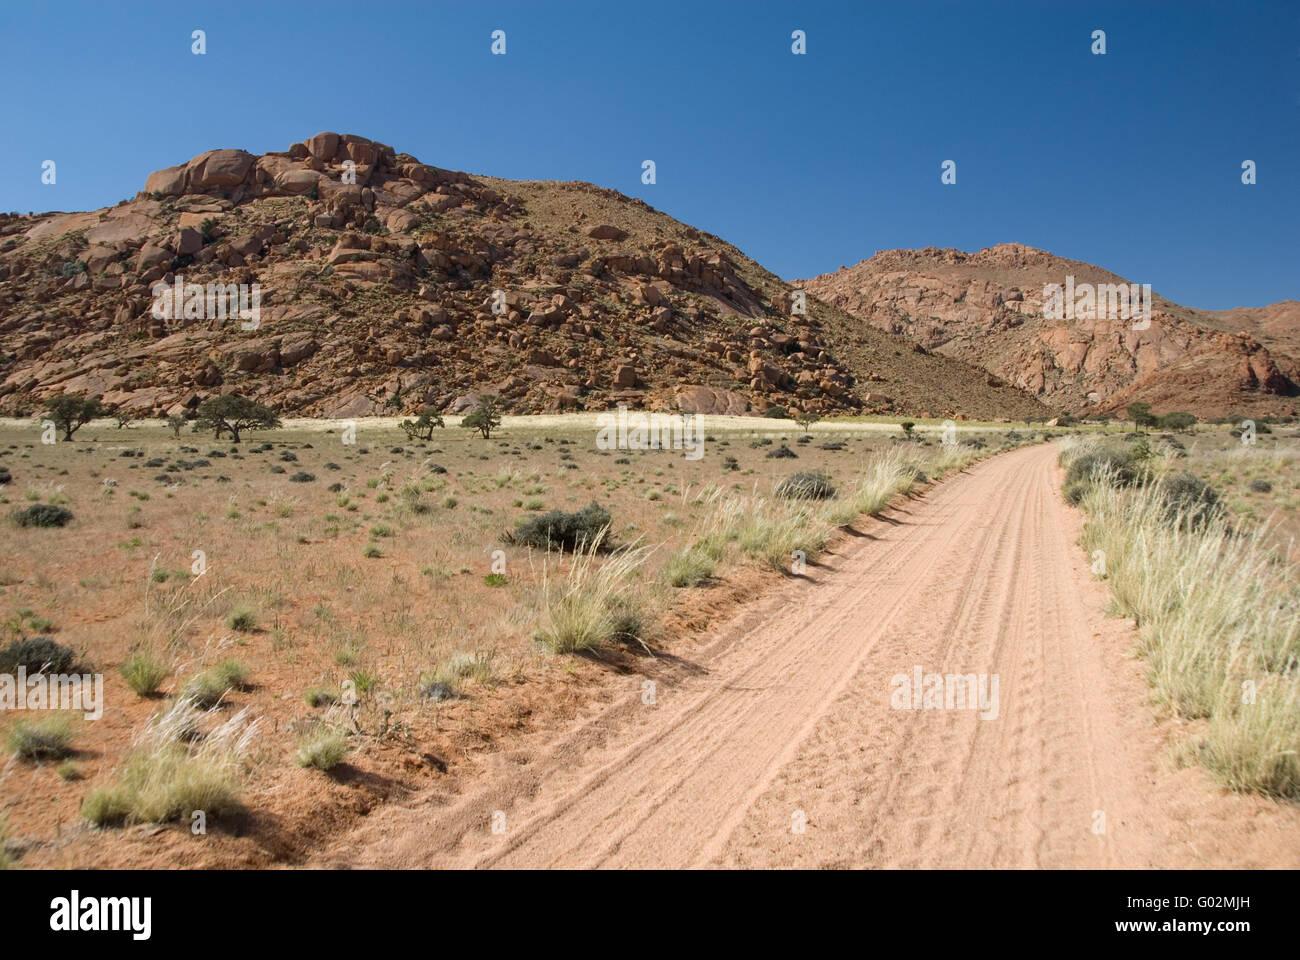 mountain landscape - Stock Image